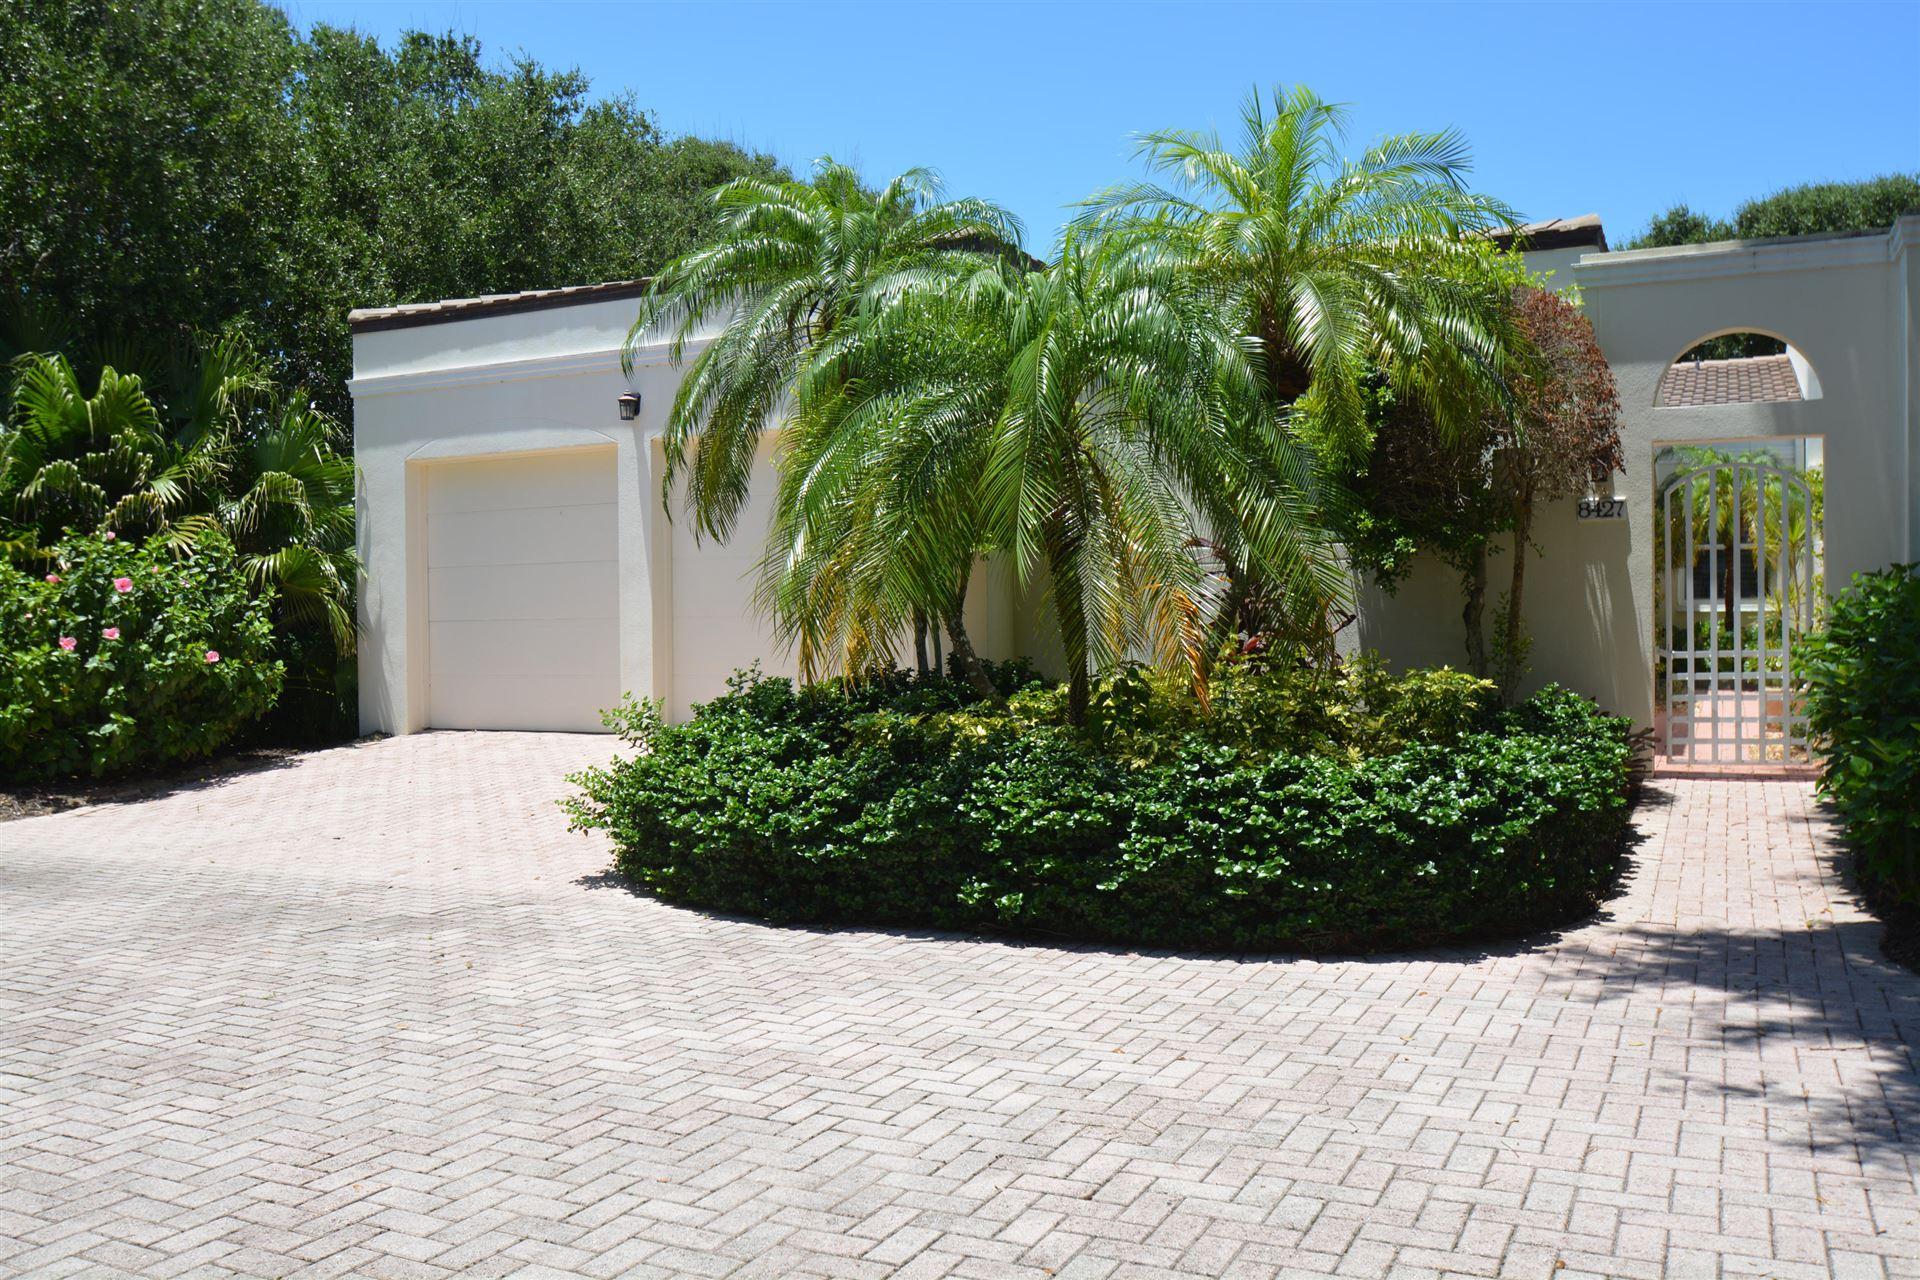 Photo of 8427 Sable Palm Court, Indian River Shores, FL 32963 (MLS # RX-10630917)